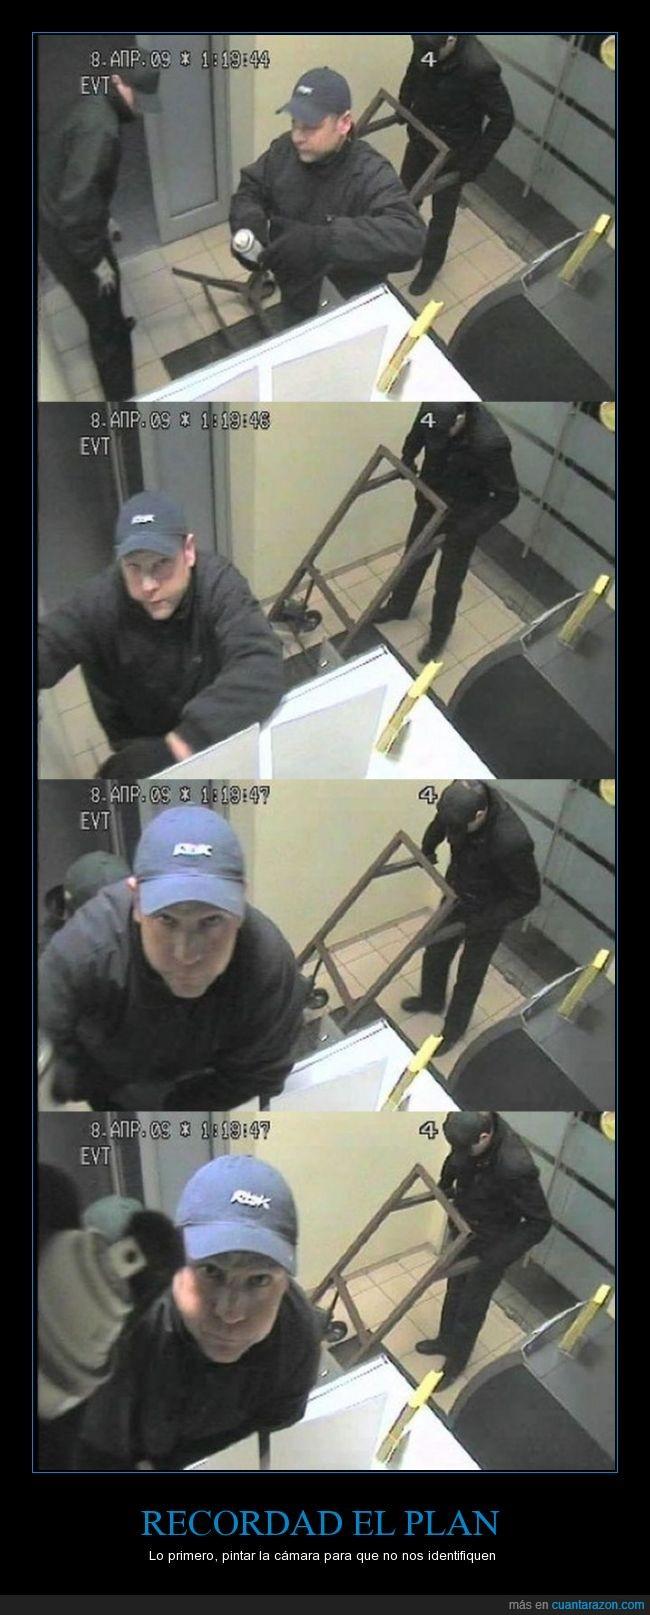 cámara,cara,fail,ladrón,pintar,reconocer,robo,seguridad,tontacos